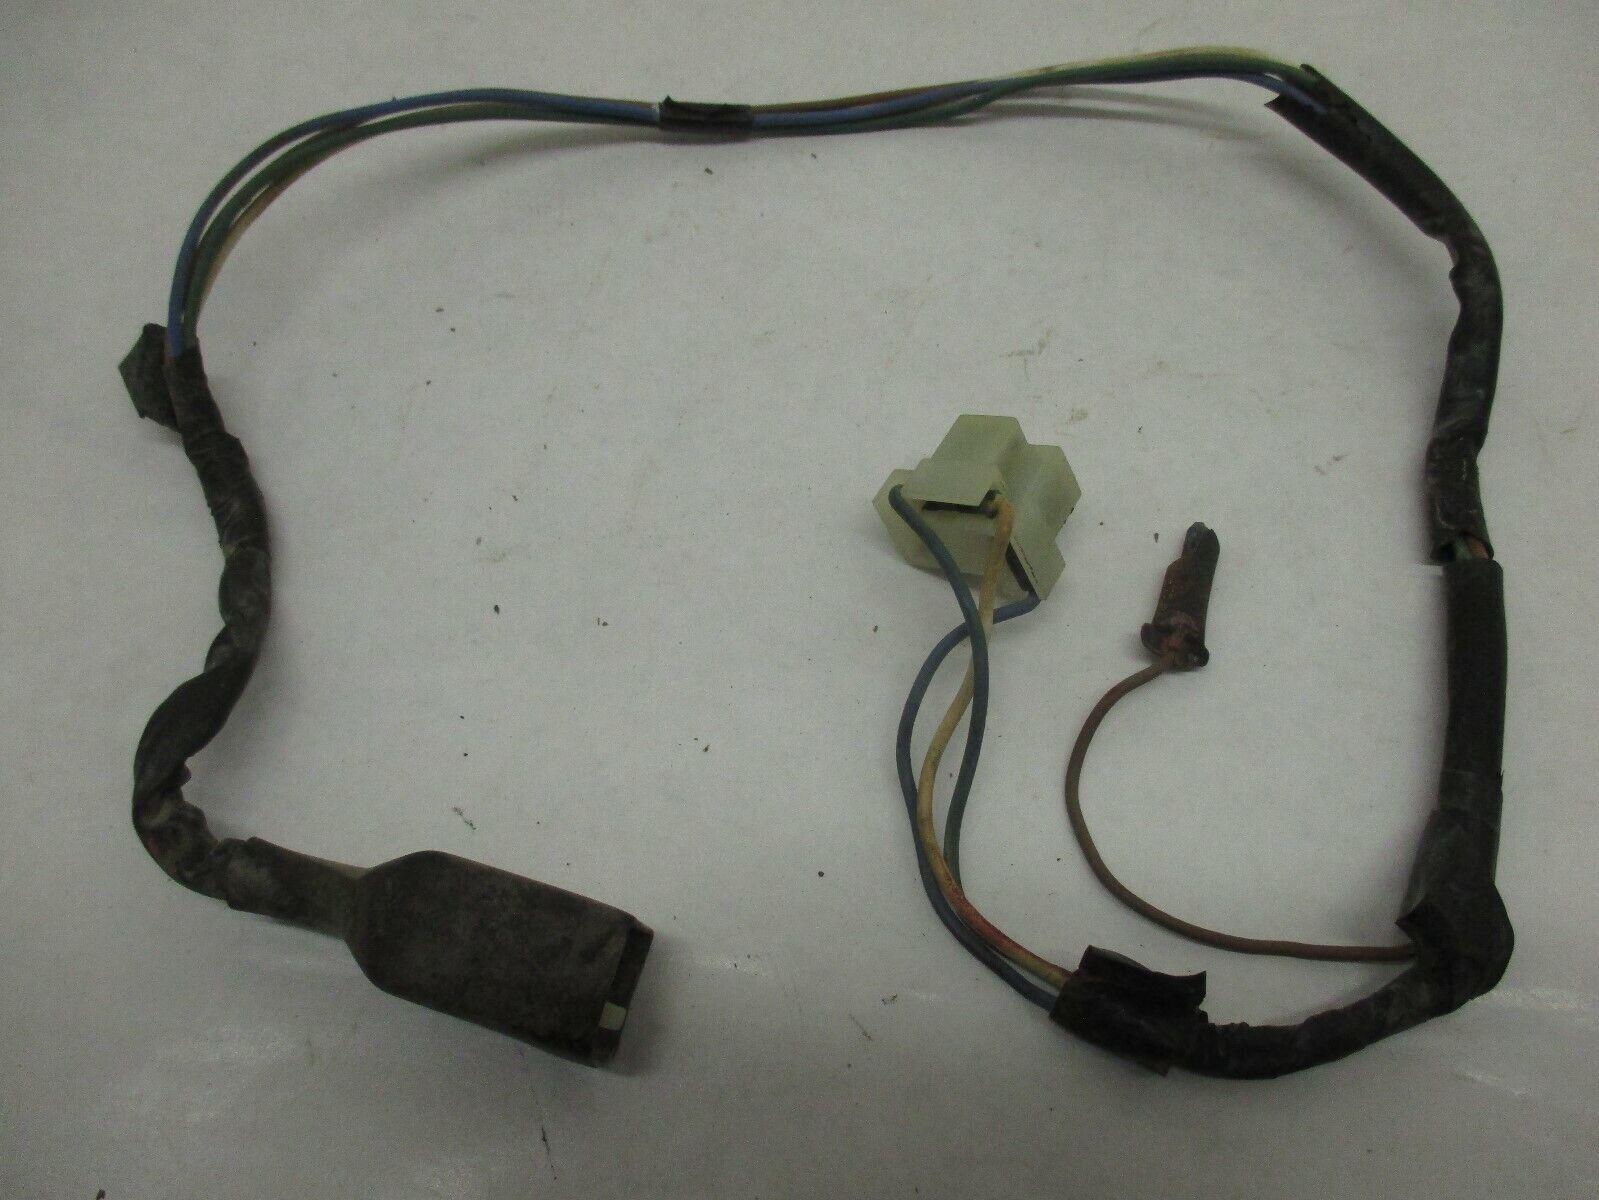 1983 Honda Odyssey FL250 Headlight Harness (7597)